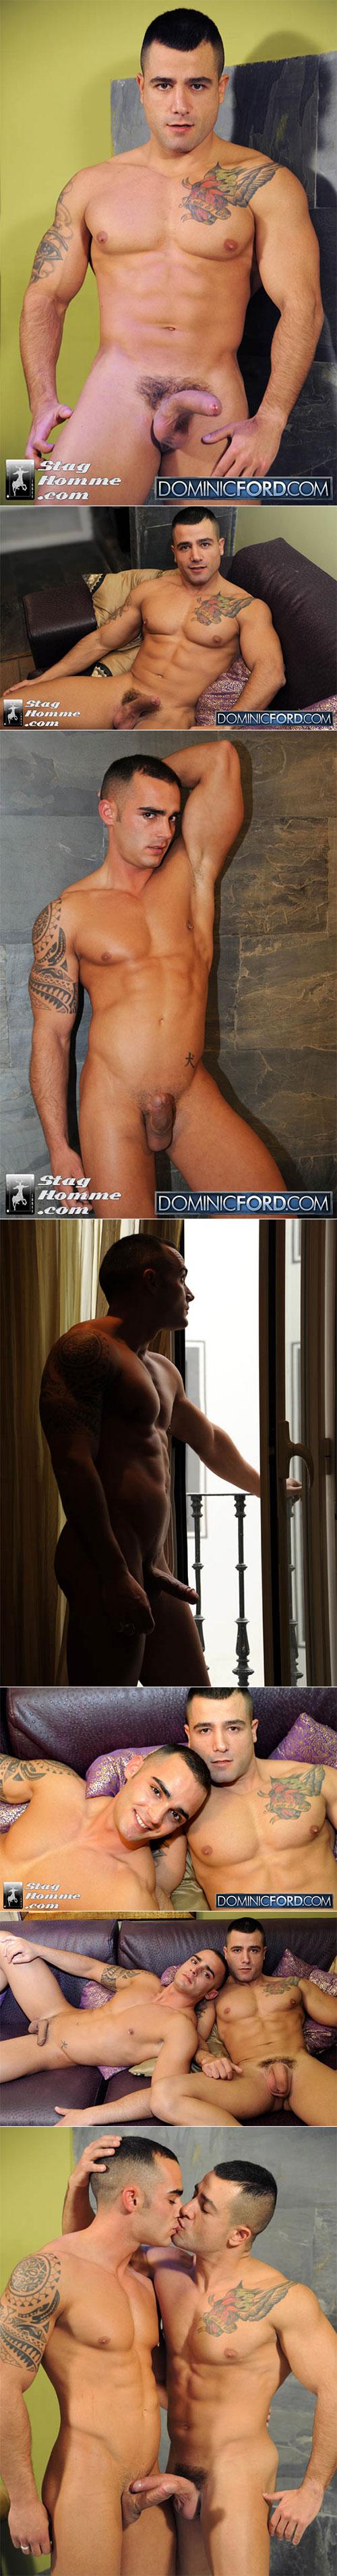 Adrian Spanish Free Gay Porn Video adrian toledo | fagalicious - gay porn blog